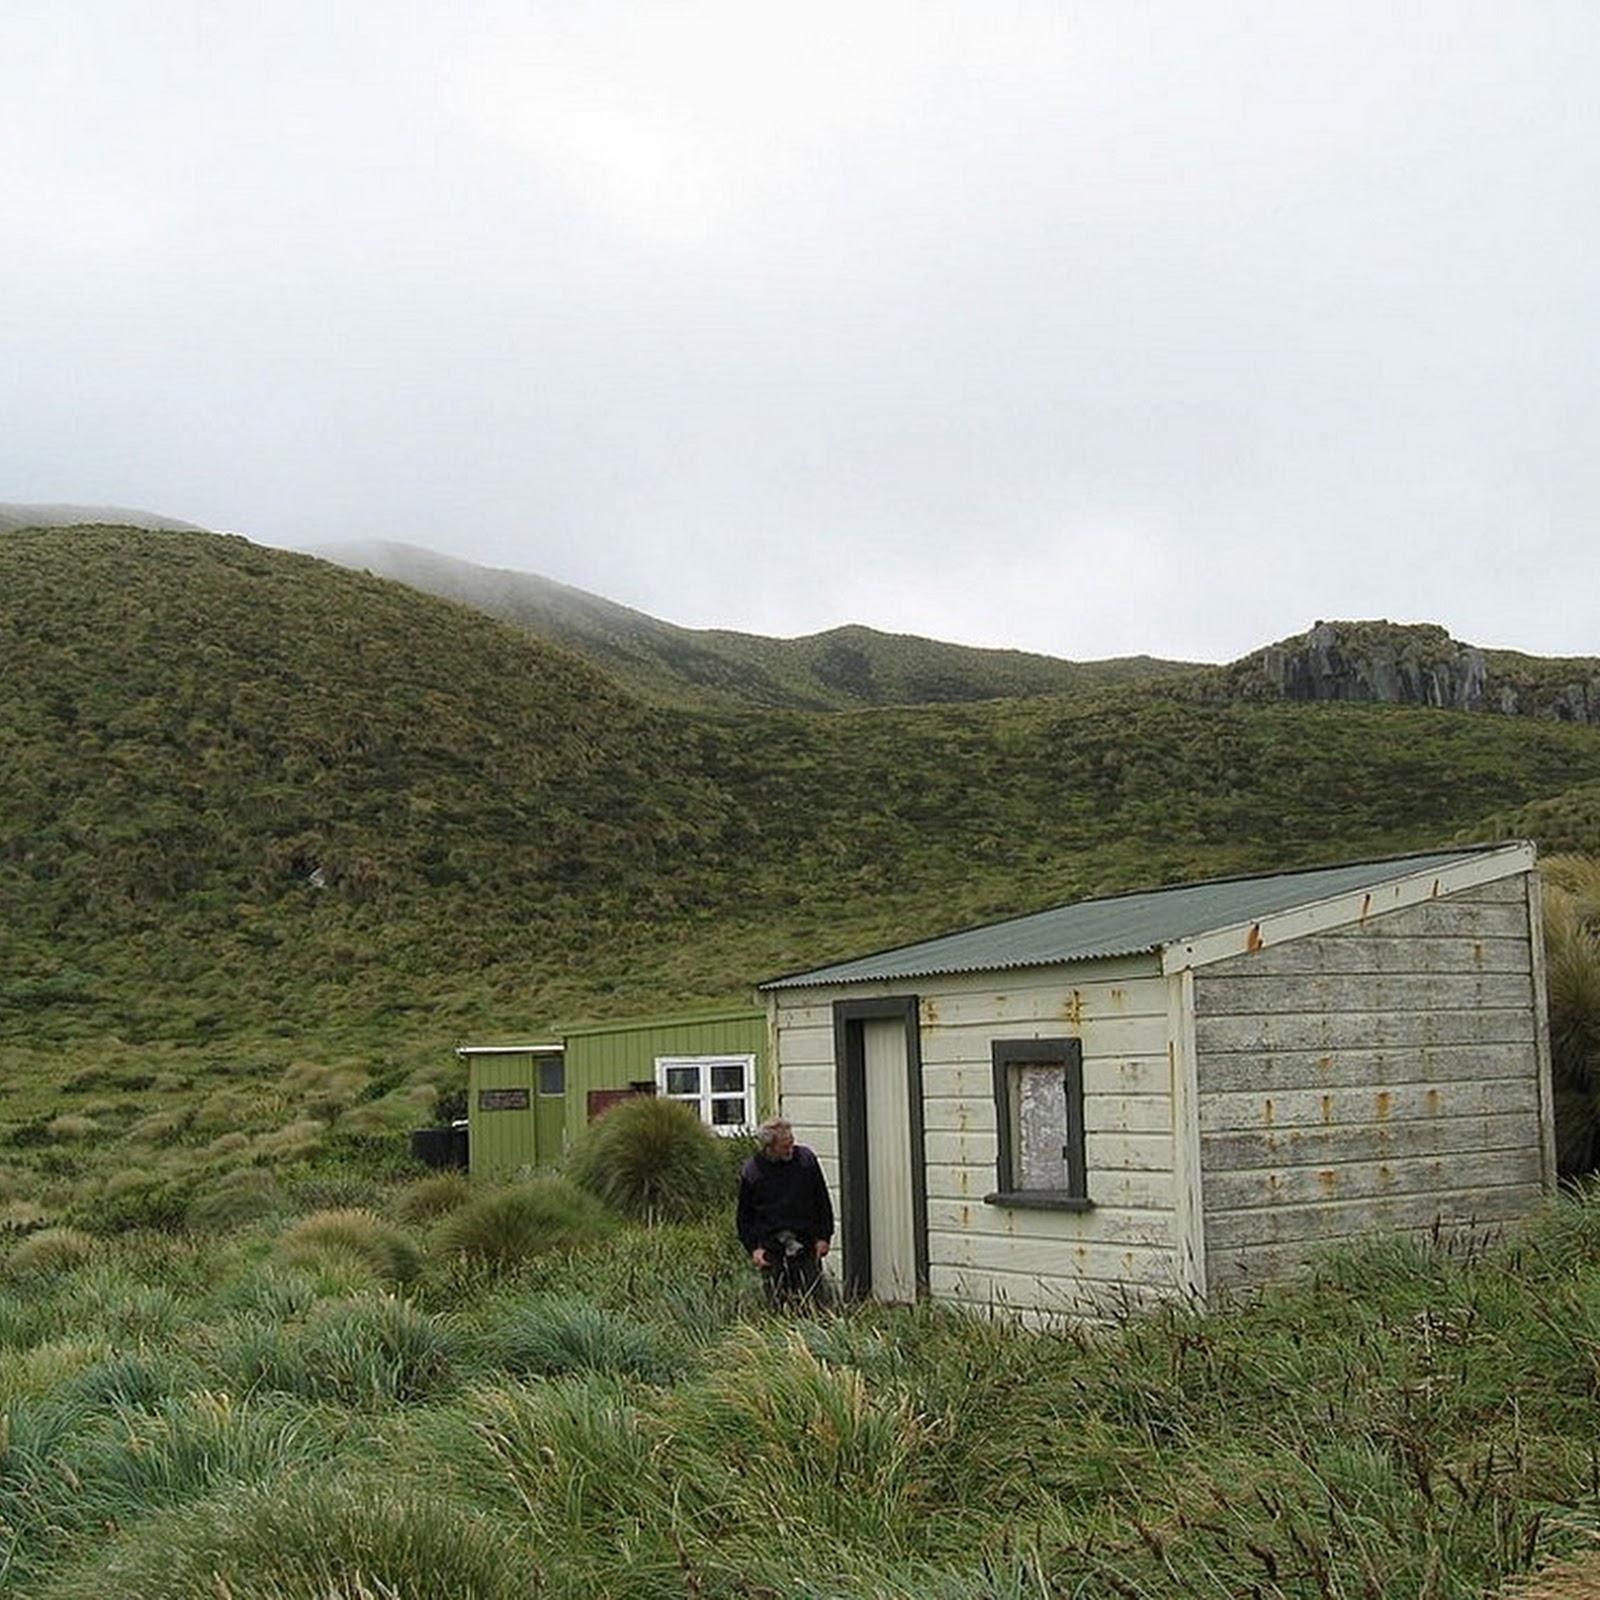 New Zealand's Castaway Depots For Shipwrecked Sailors